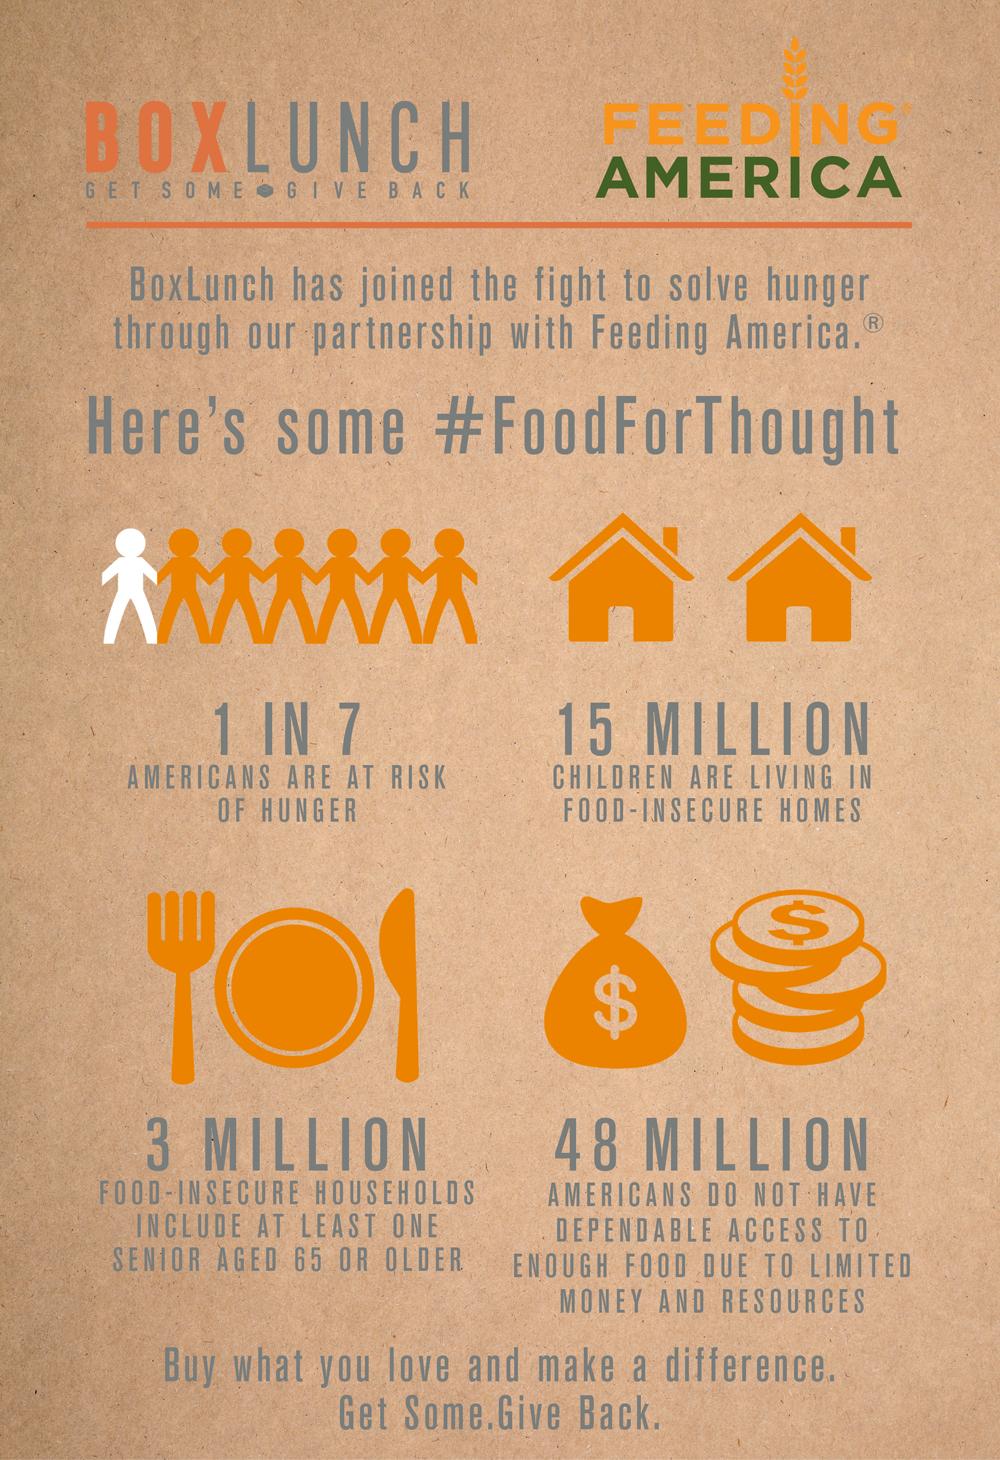 box lunch feeding america infographic